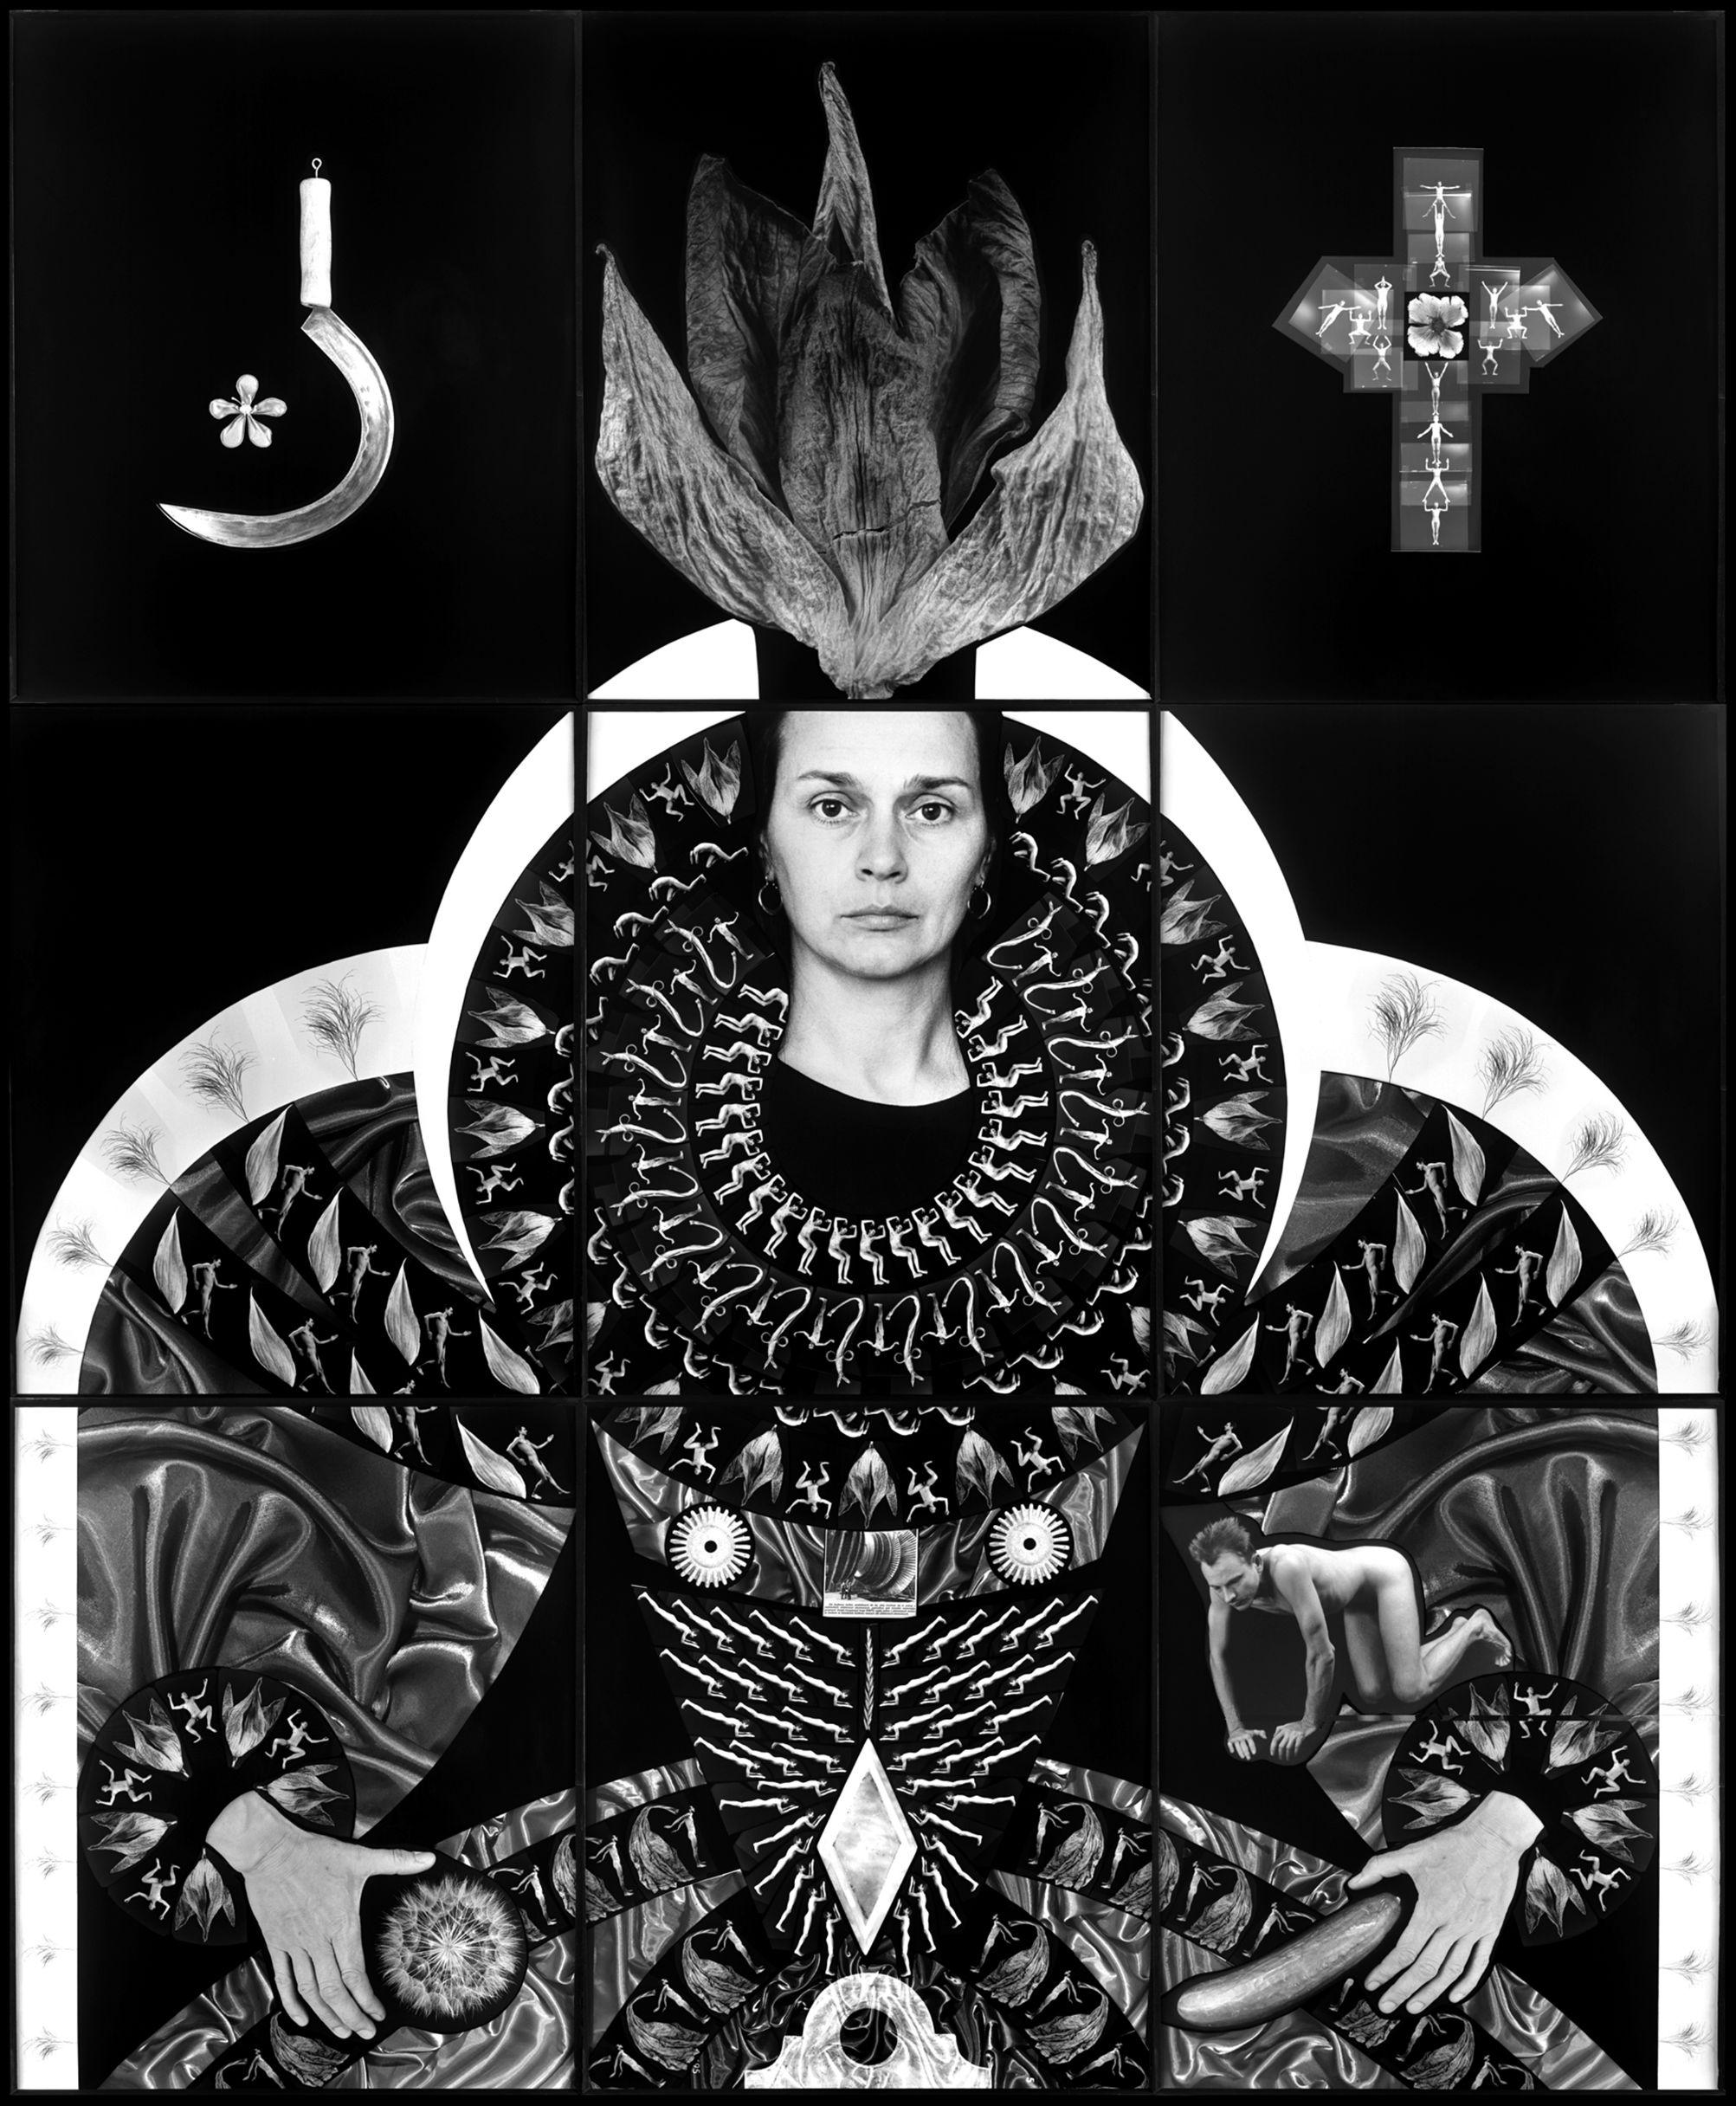 Zofia Kulik, Self Magnificence IIIb, 1997